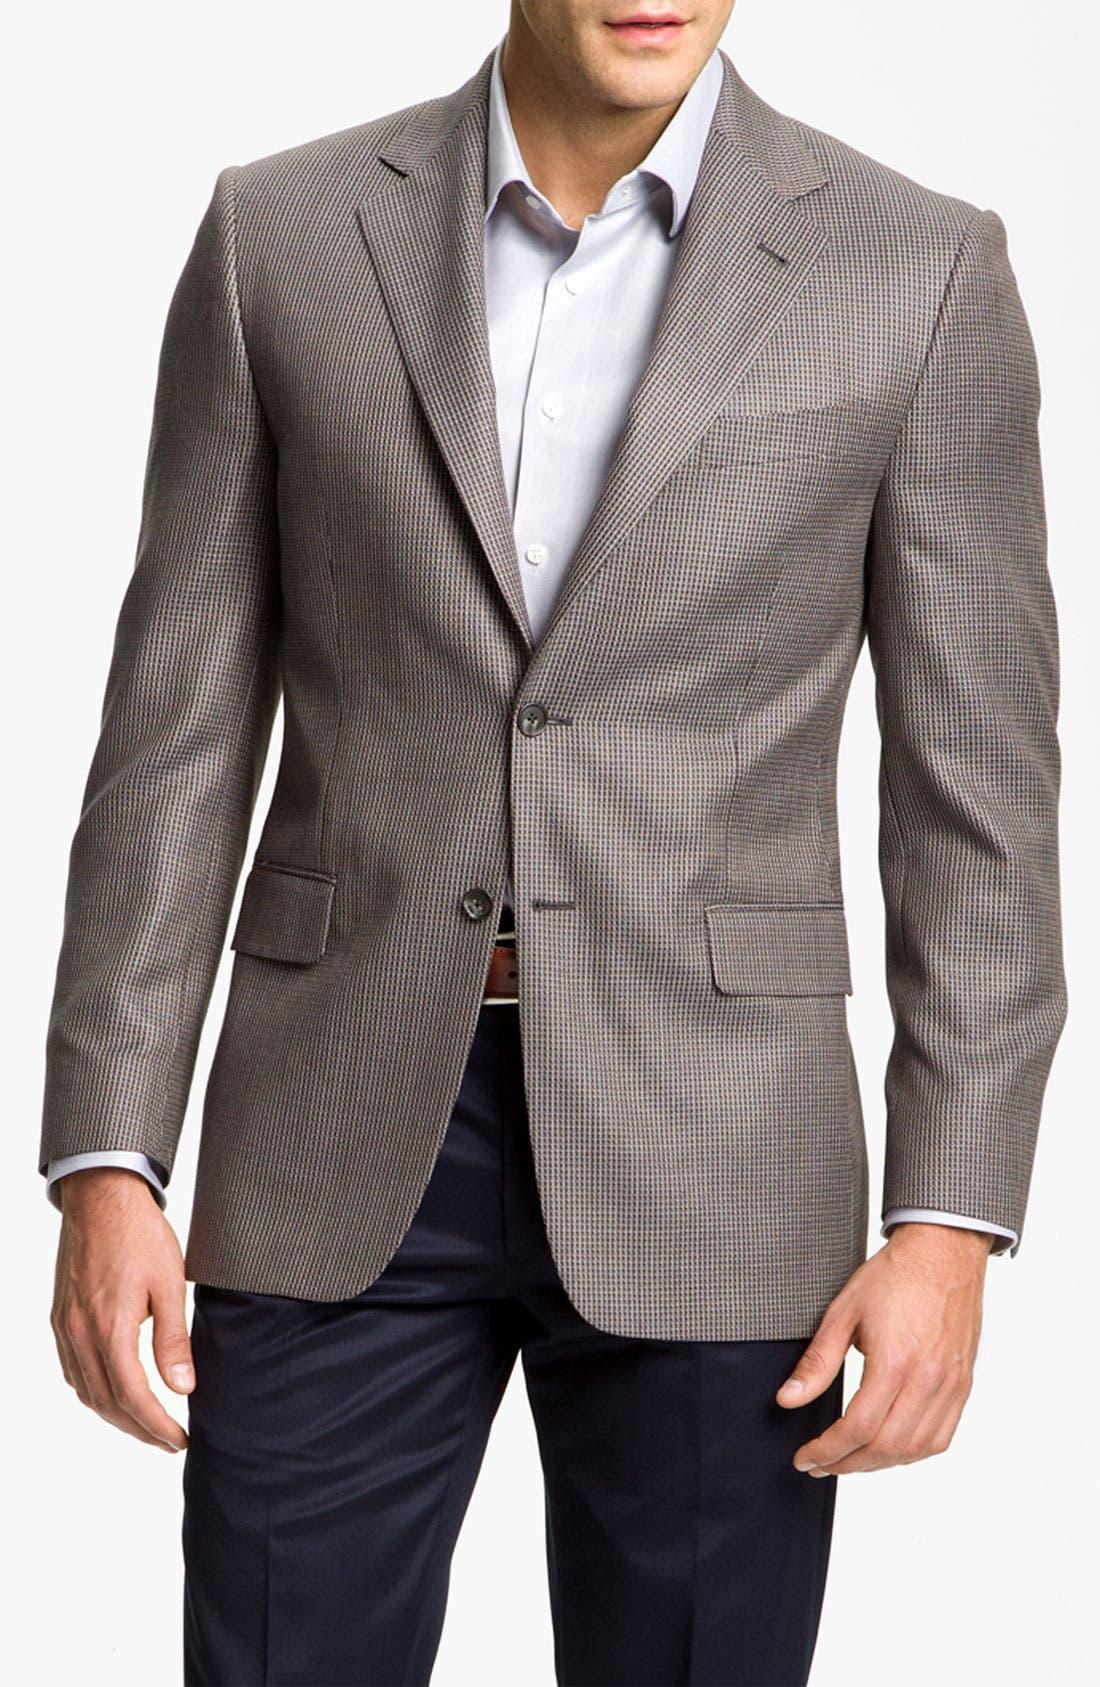 Main Image - Joseph Abboud 'Signature Silver' Sportcoat